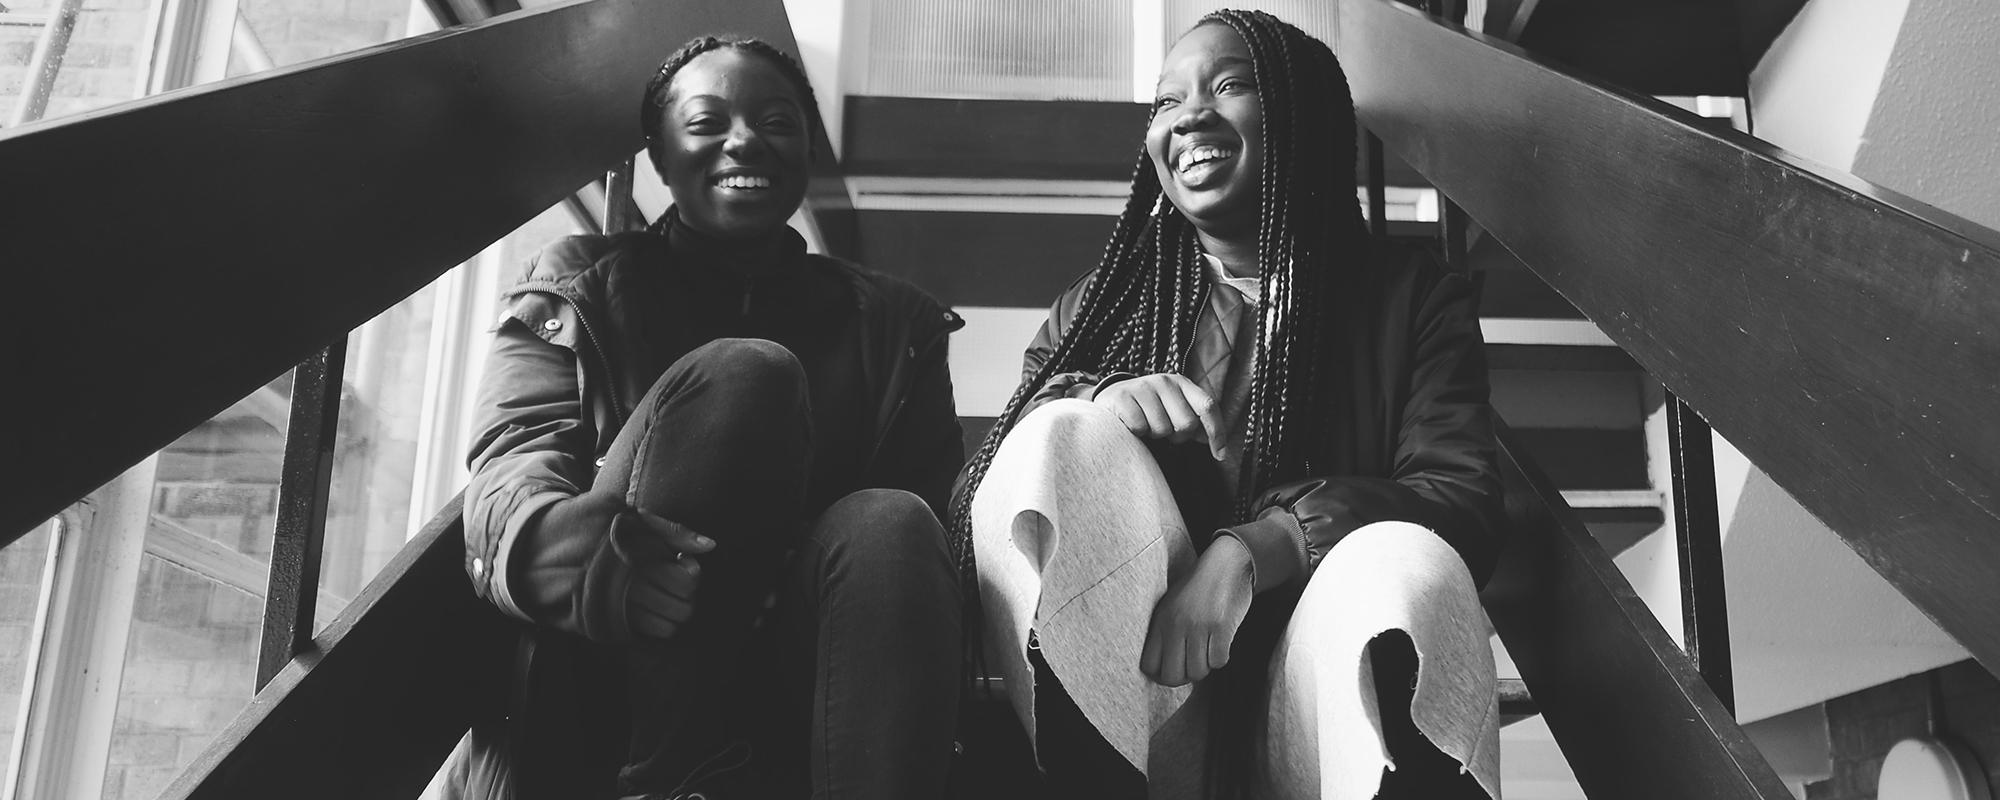 Bosola Ajenifuja and Vanessa Tenkorang, authors of Chalkhill. Photo: Abdou Cisse